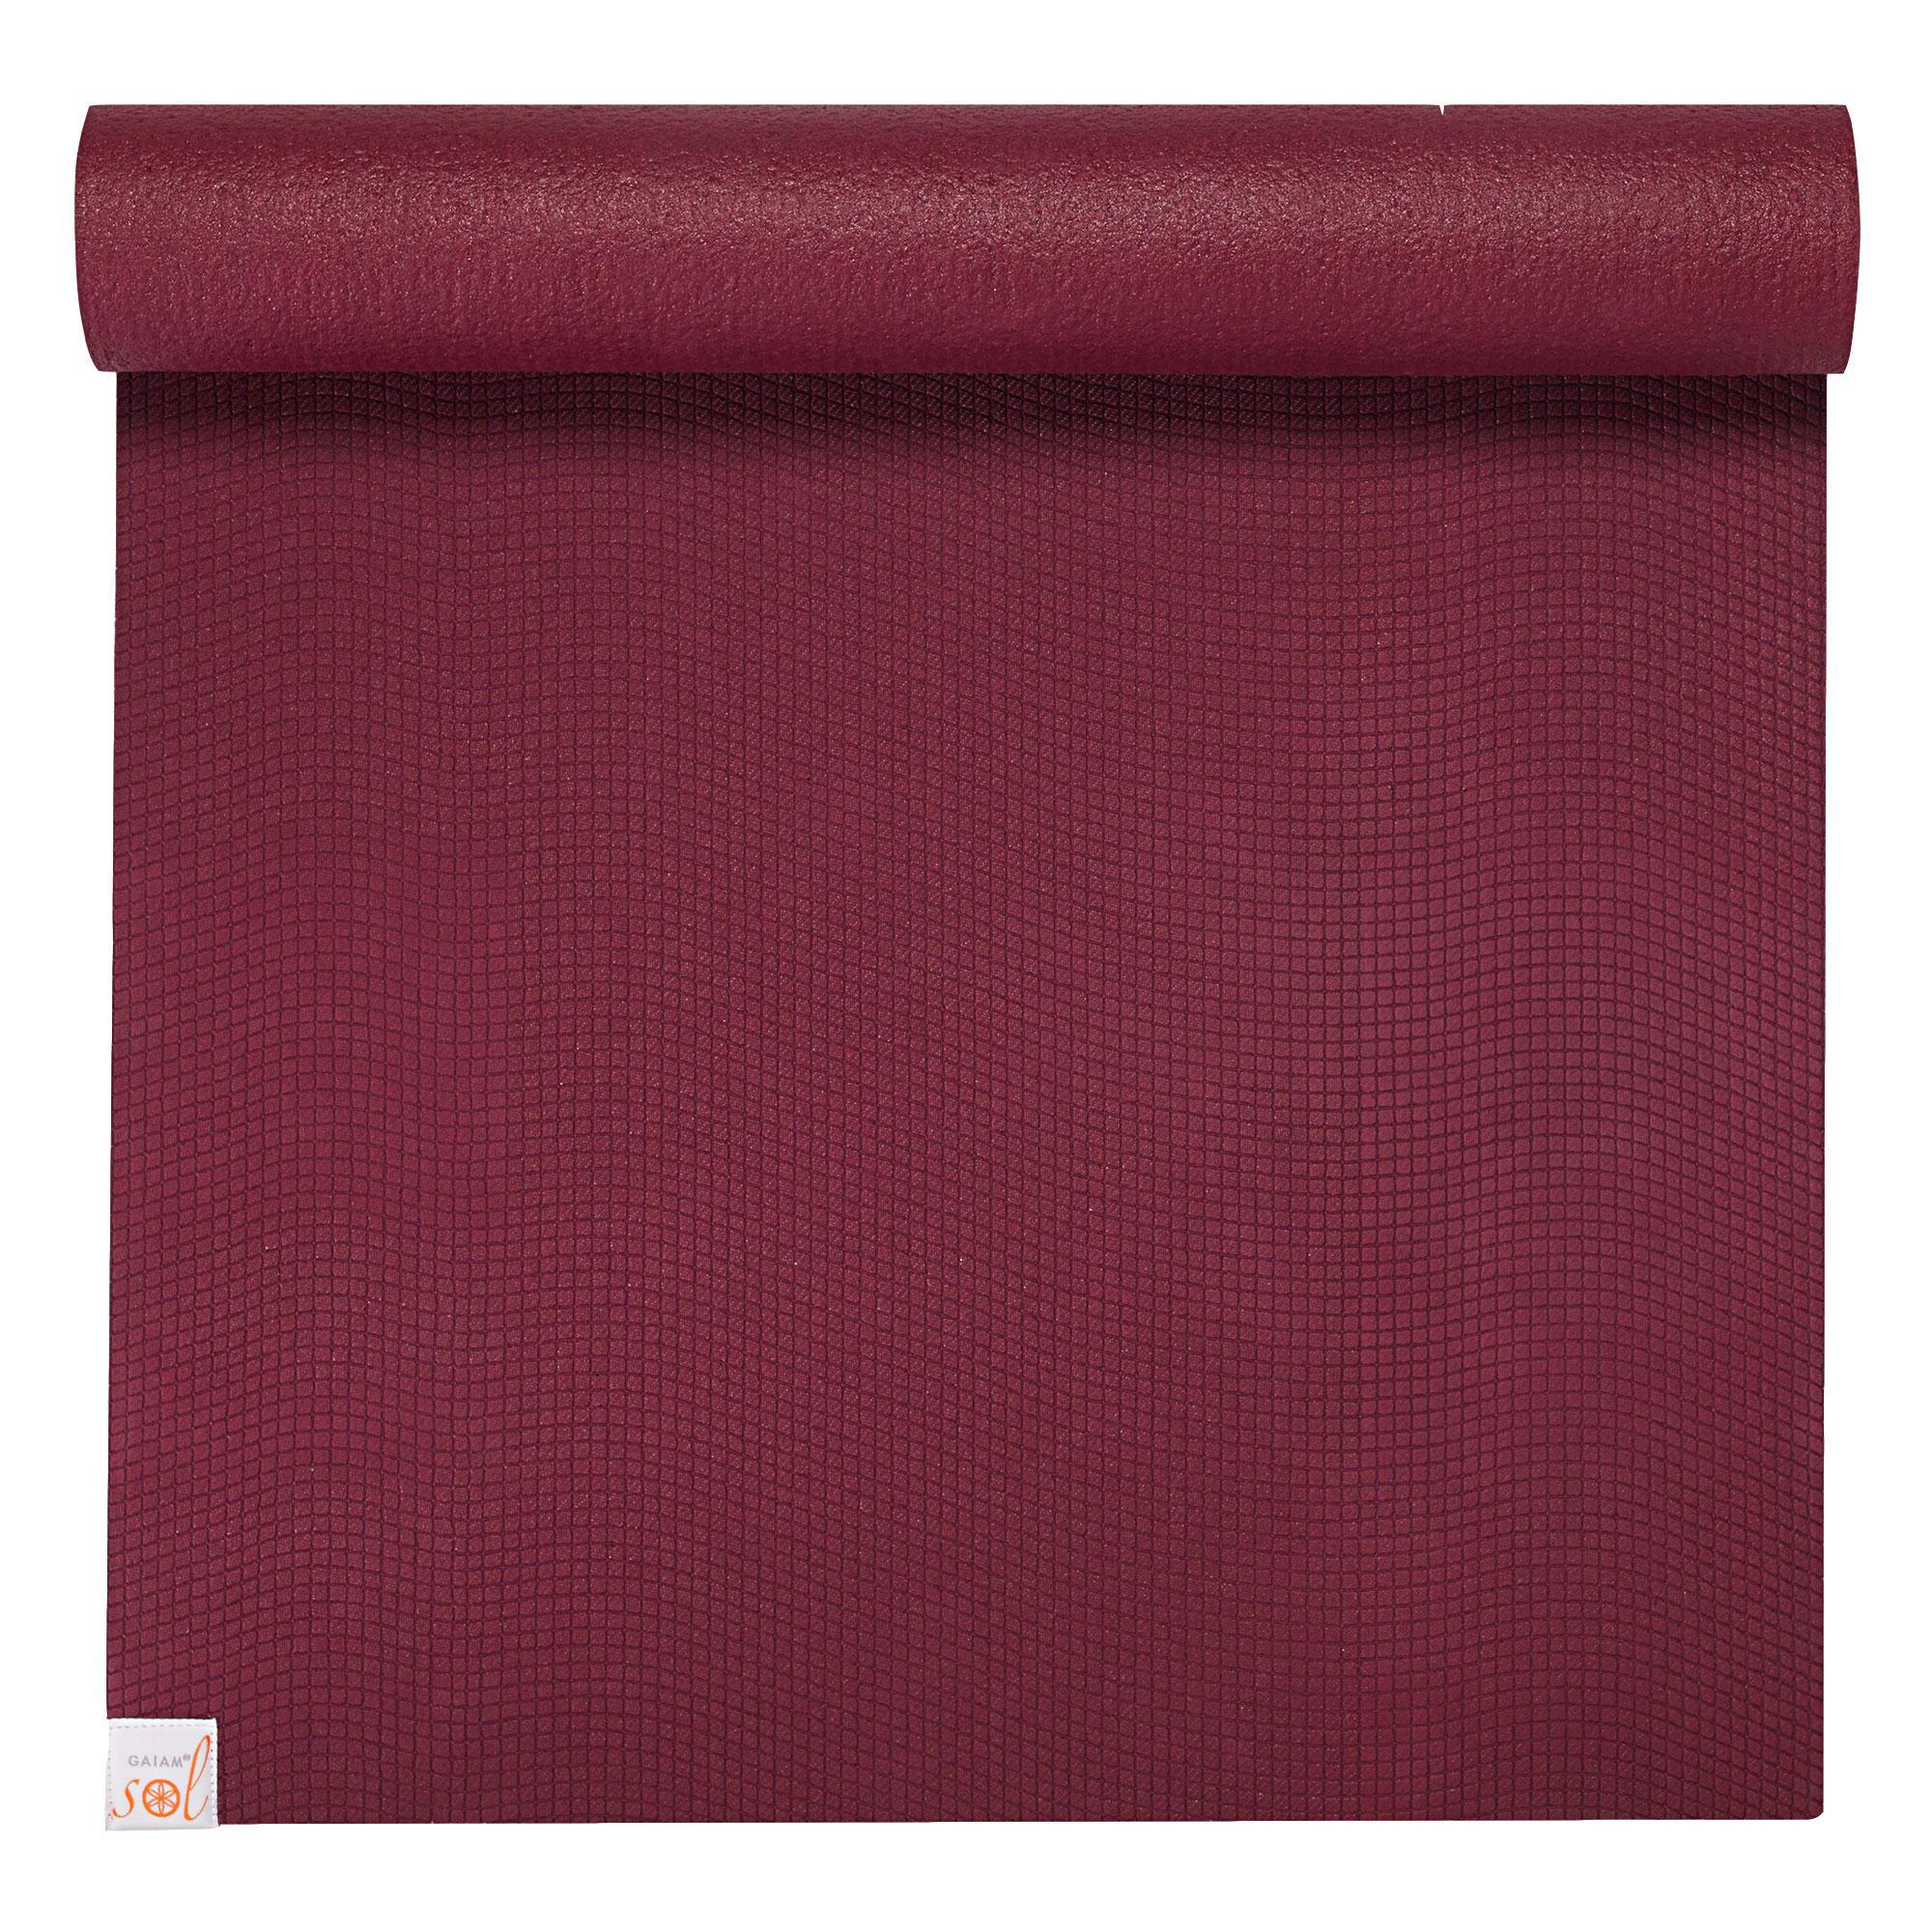 Amazon Com Gaiam Sol Sure Grip Yoga Mat Cranberry 4mm